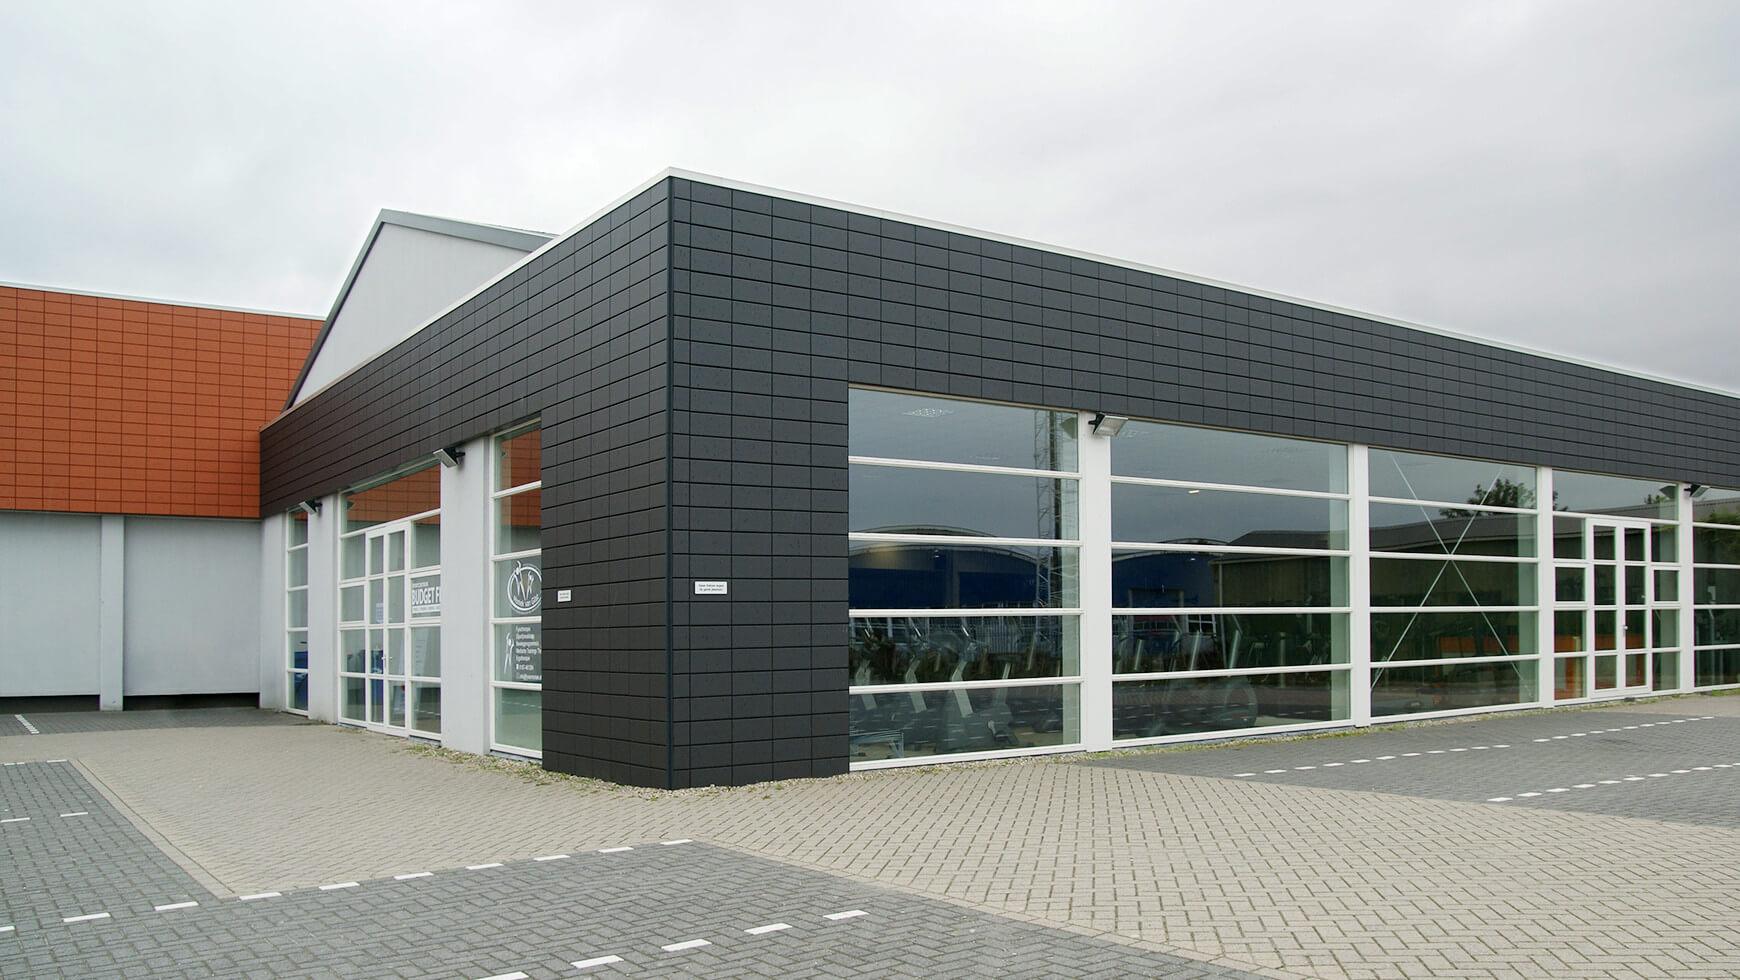 Sportcentrum Bfit Middelharnis